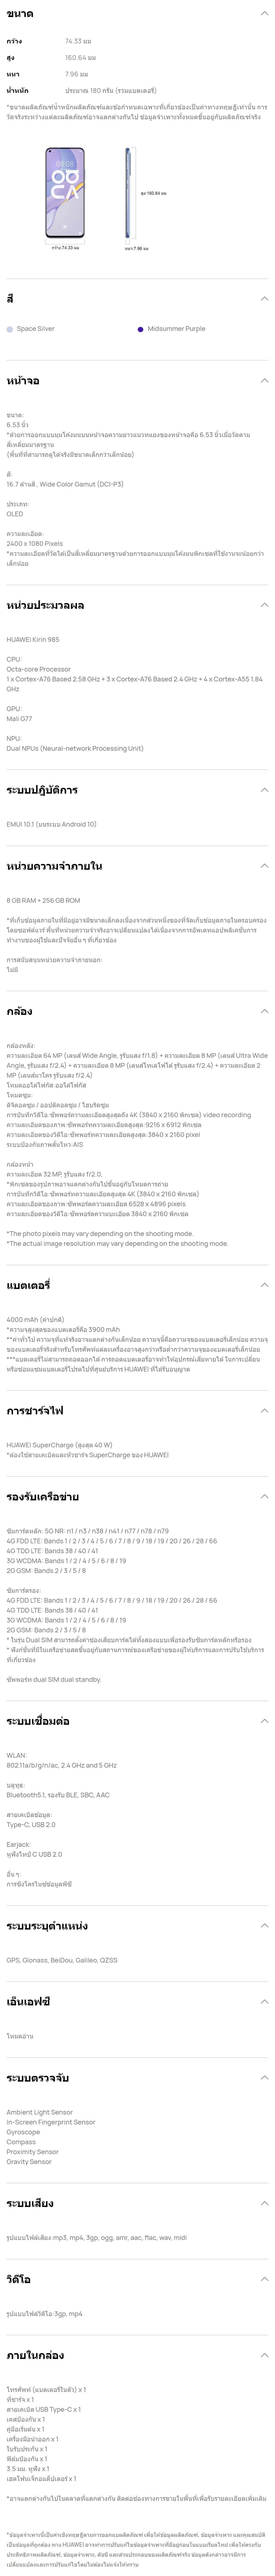 long-page-2.jpg